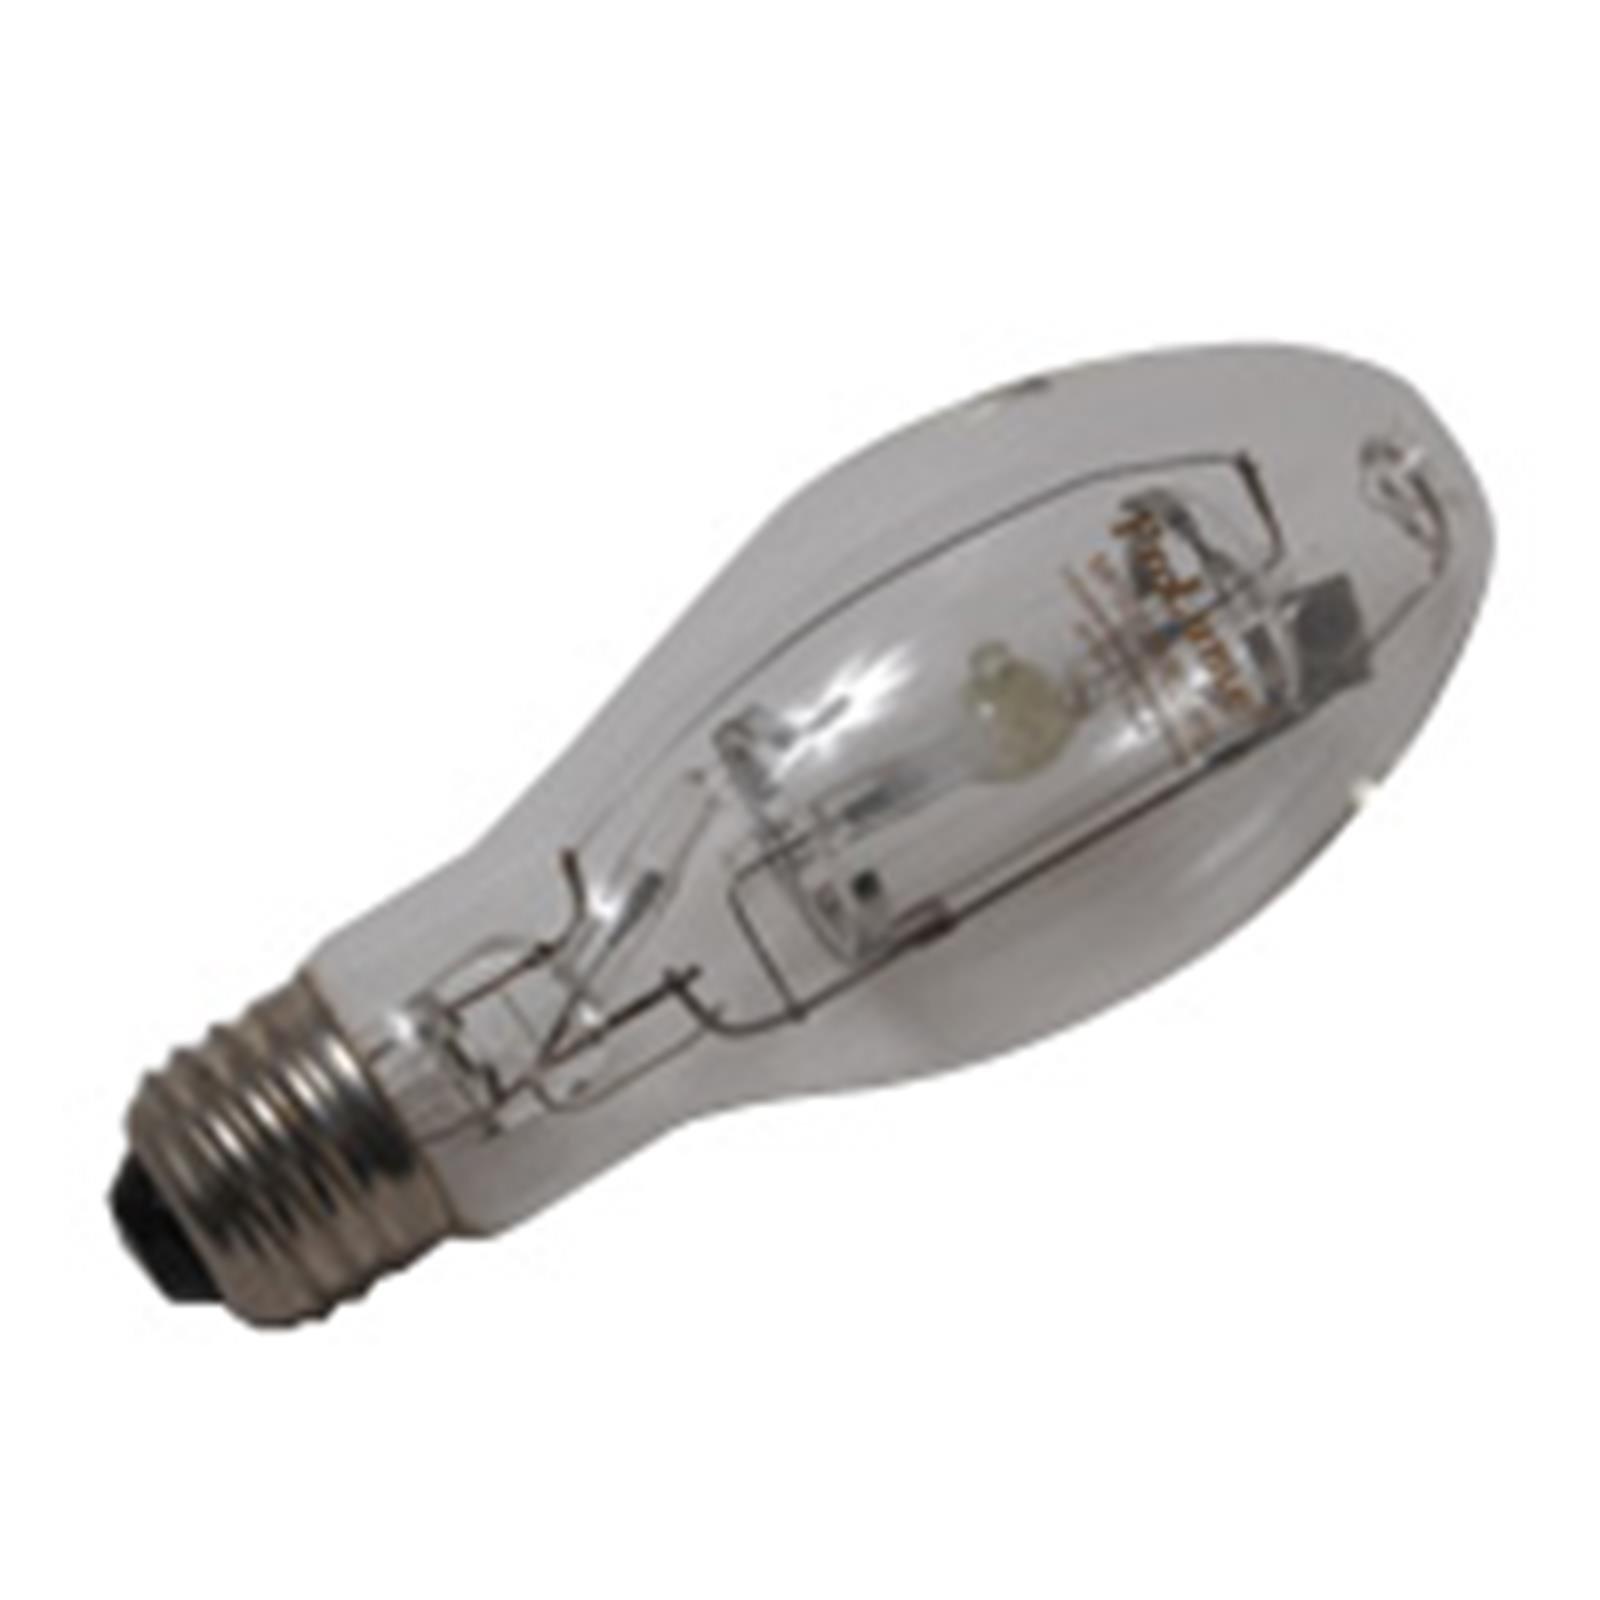 4 Qty. Halco 150W MP ED17 Med PS ProLumeUN2911 M102/O MP150/U/MED/PS 150w HID Pulse Start Clear Lamp Bulb